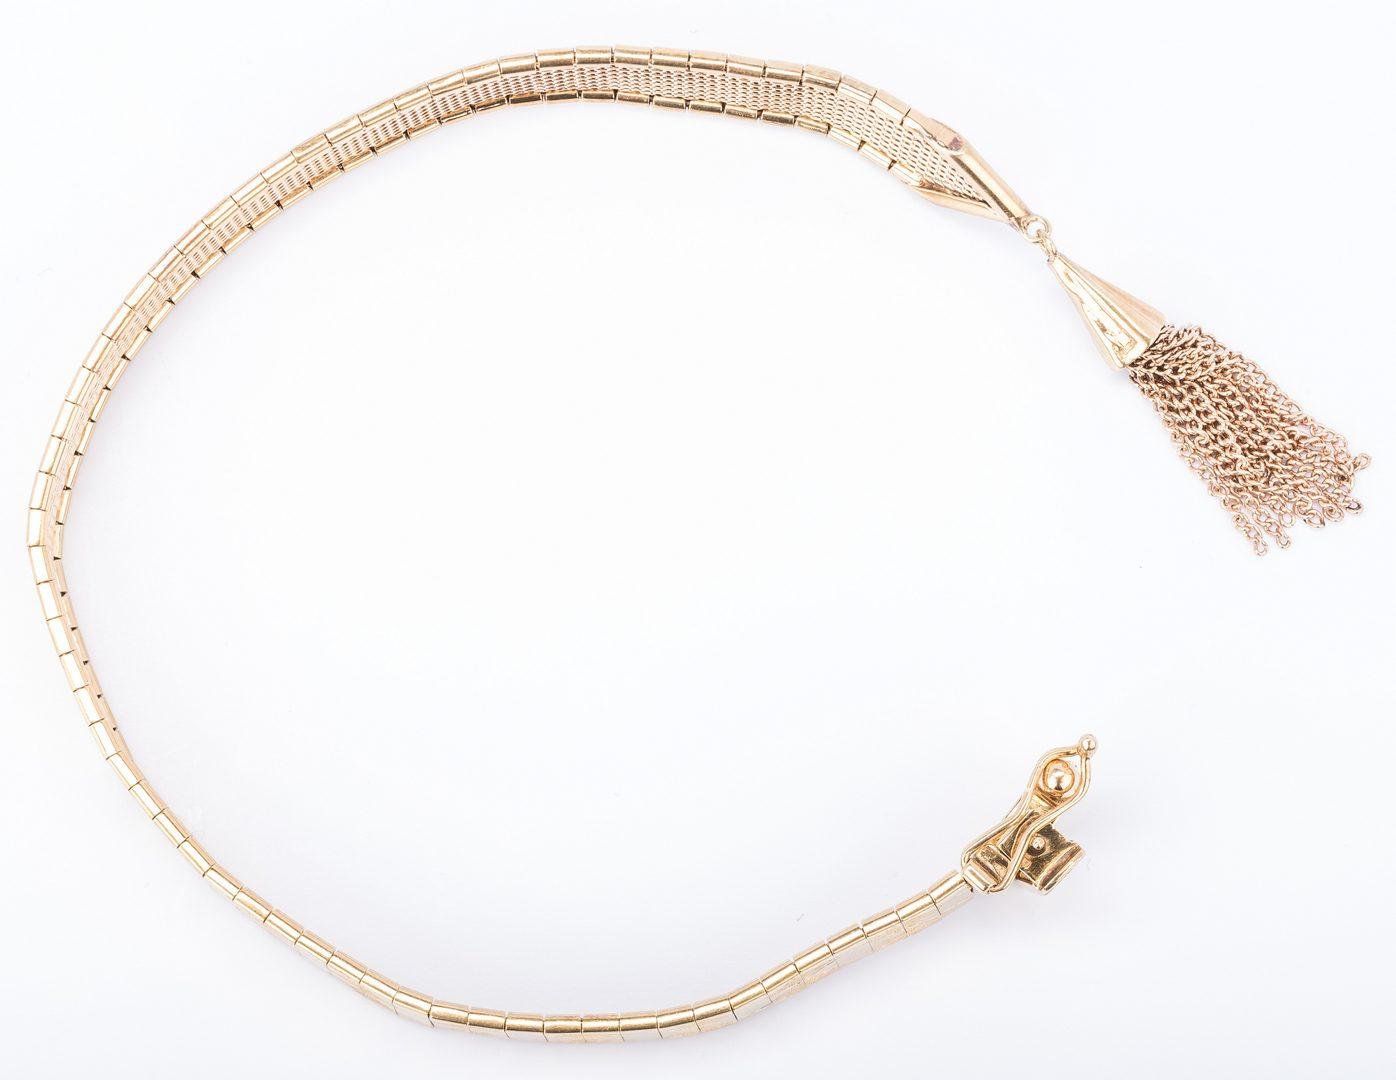 Lot 681: 14K Gold Tassel Bracelet, Harlequin Design